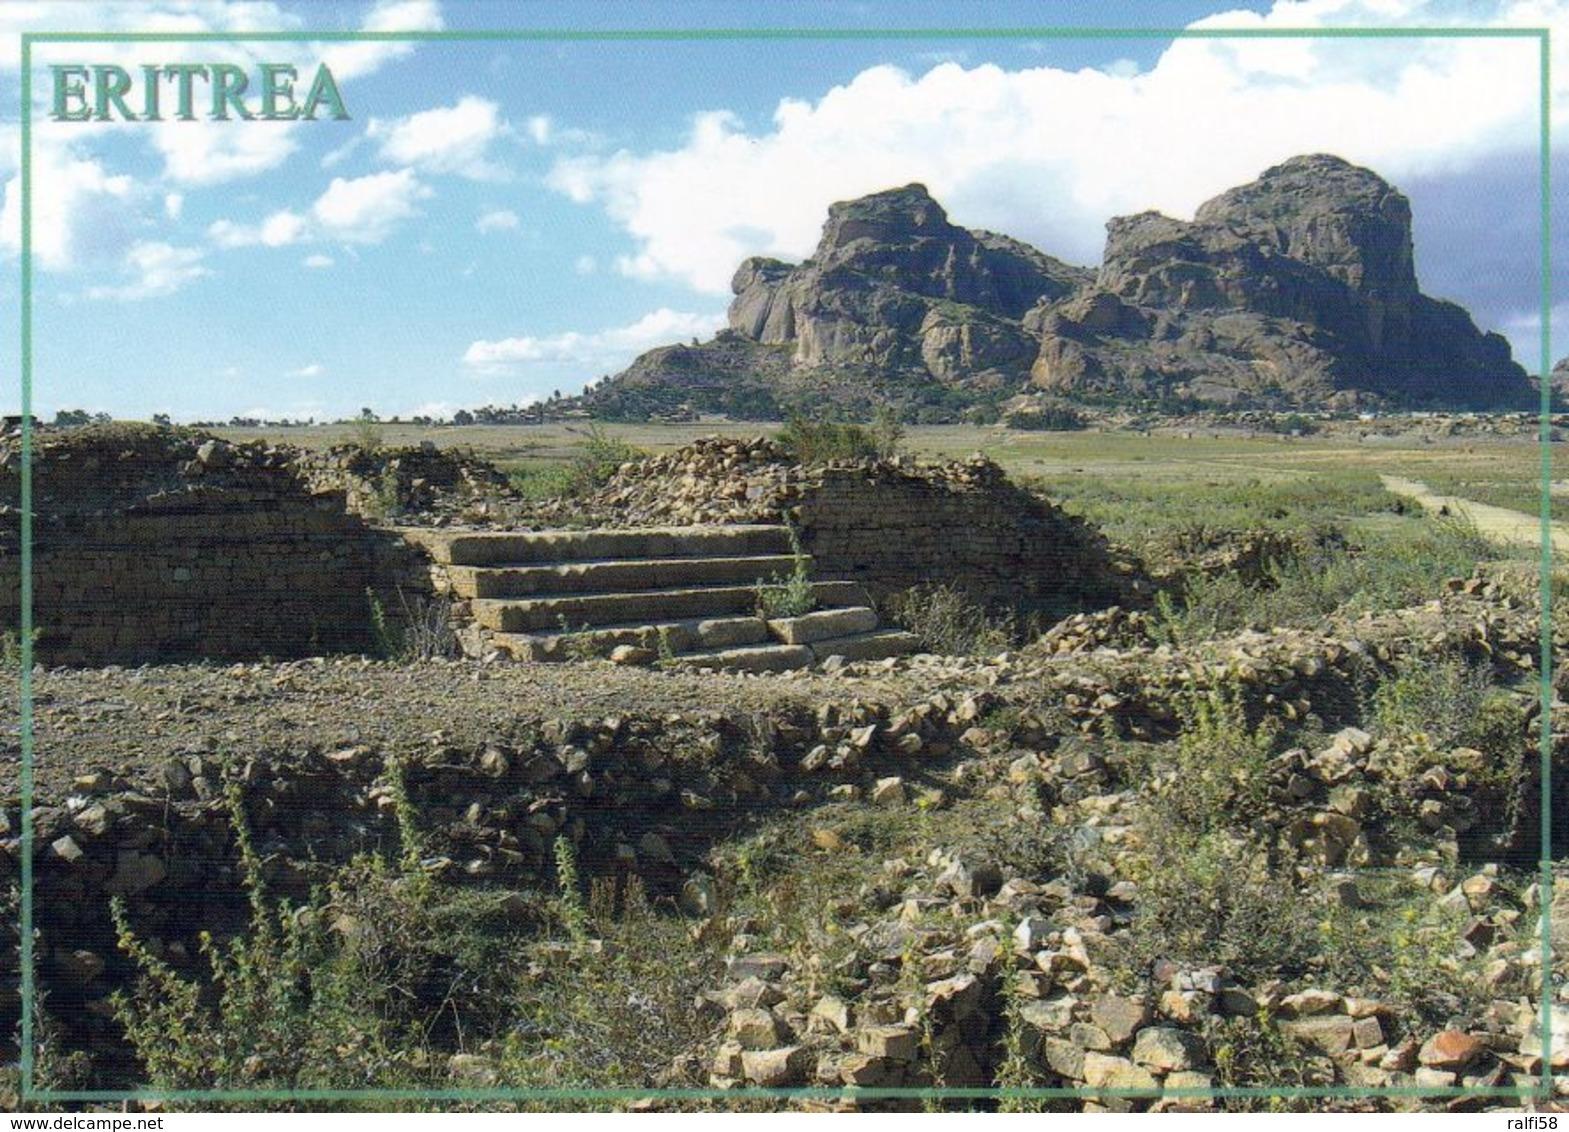 1 AK Eritrea * Ruinen Von Matara - Eine Der Historischen Stätten In Eritrea * - Eritrea